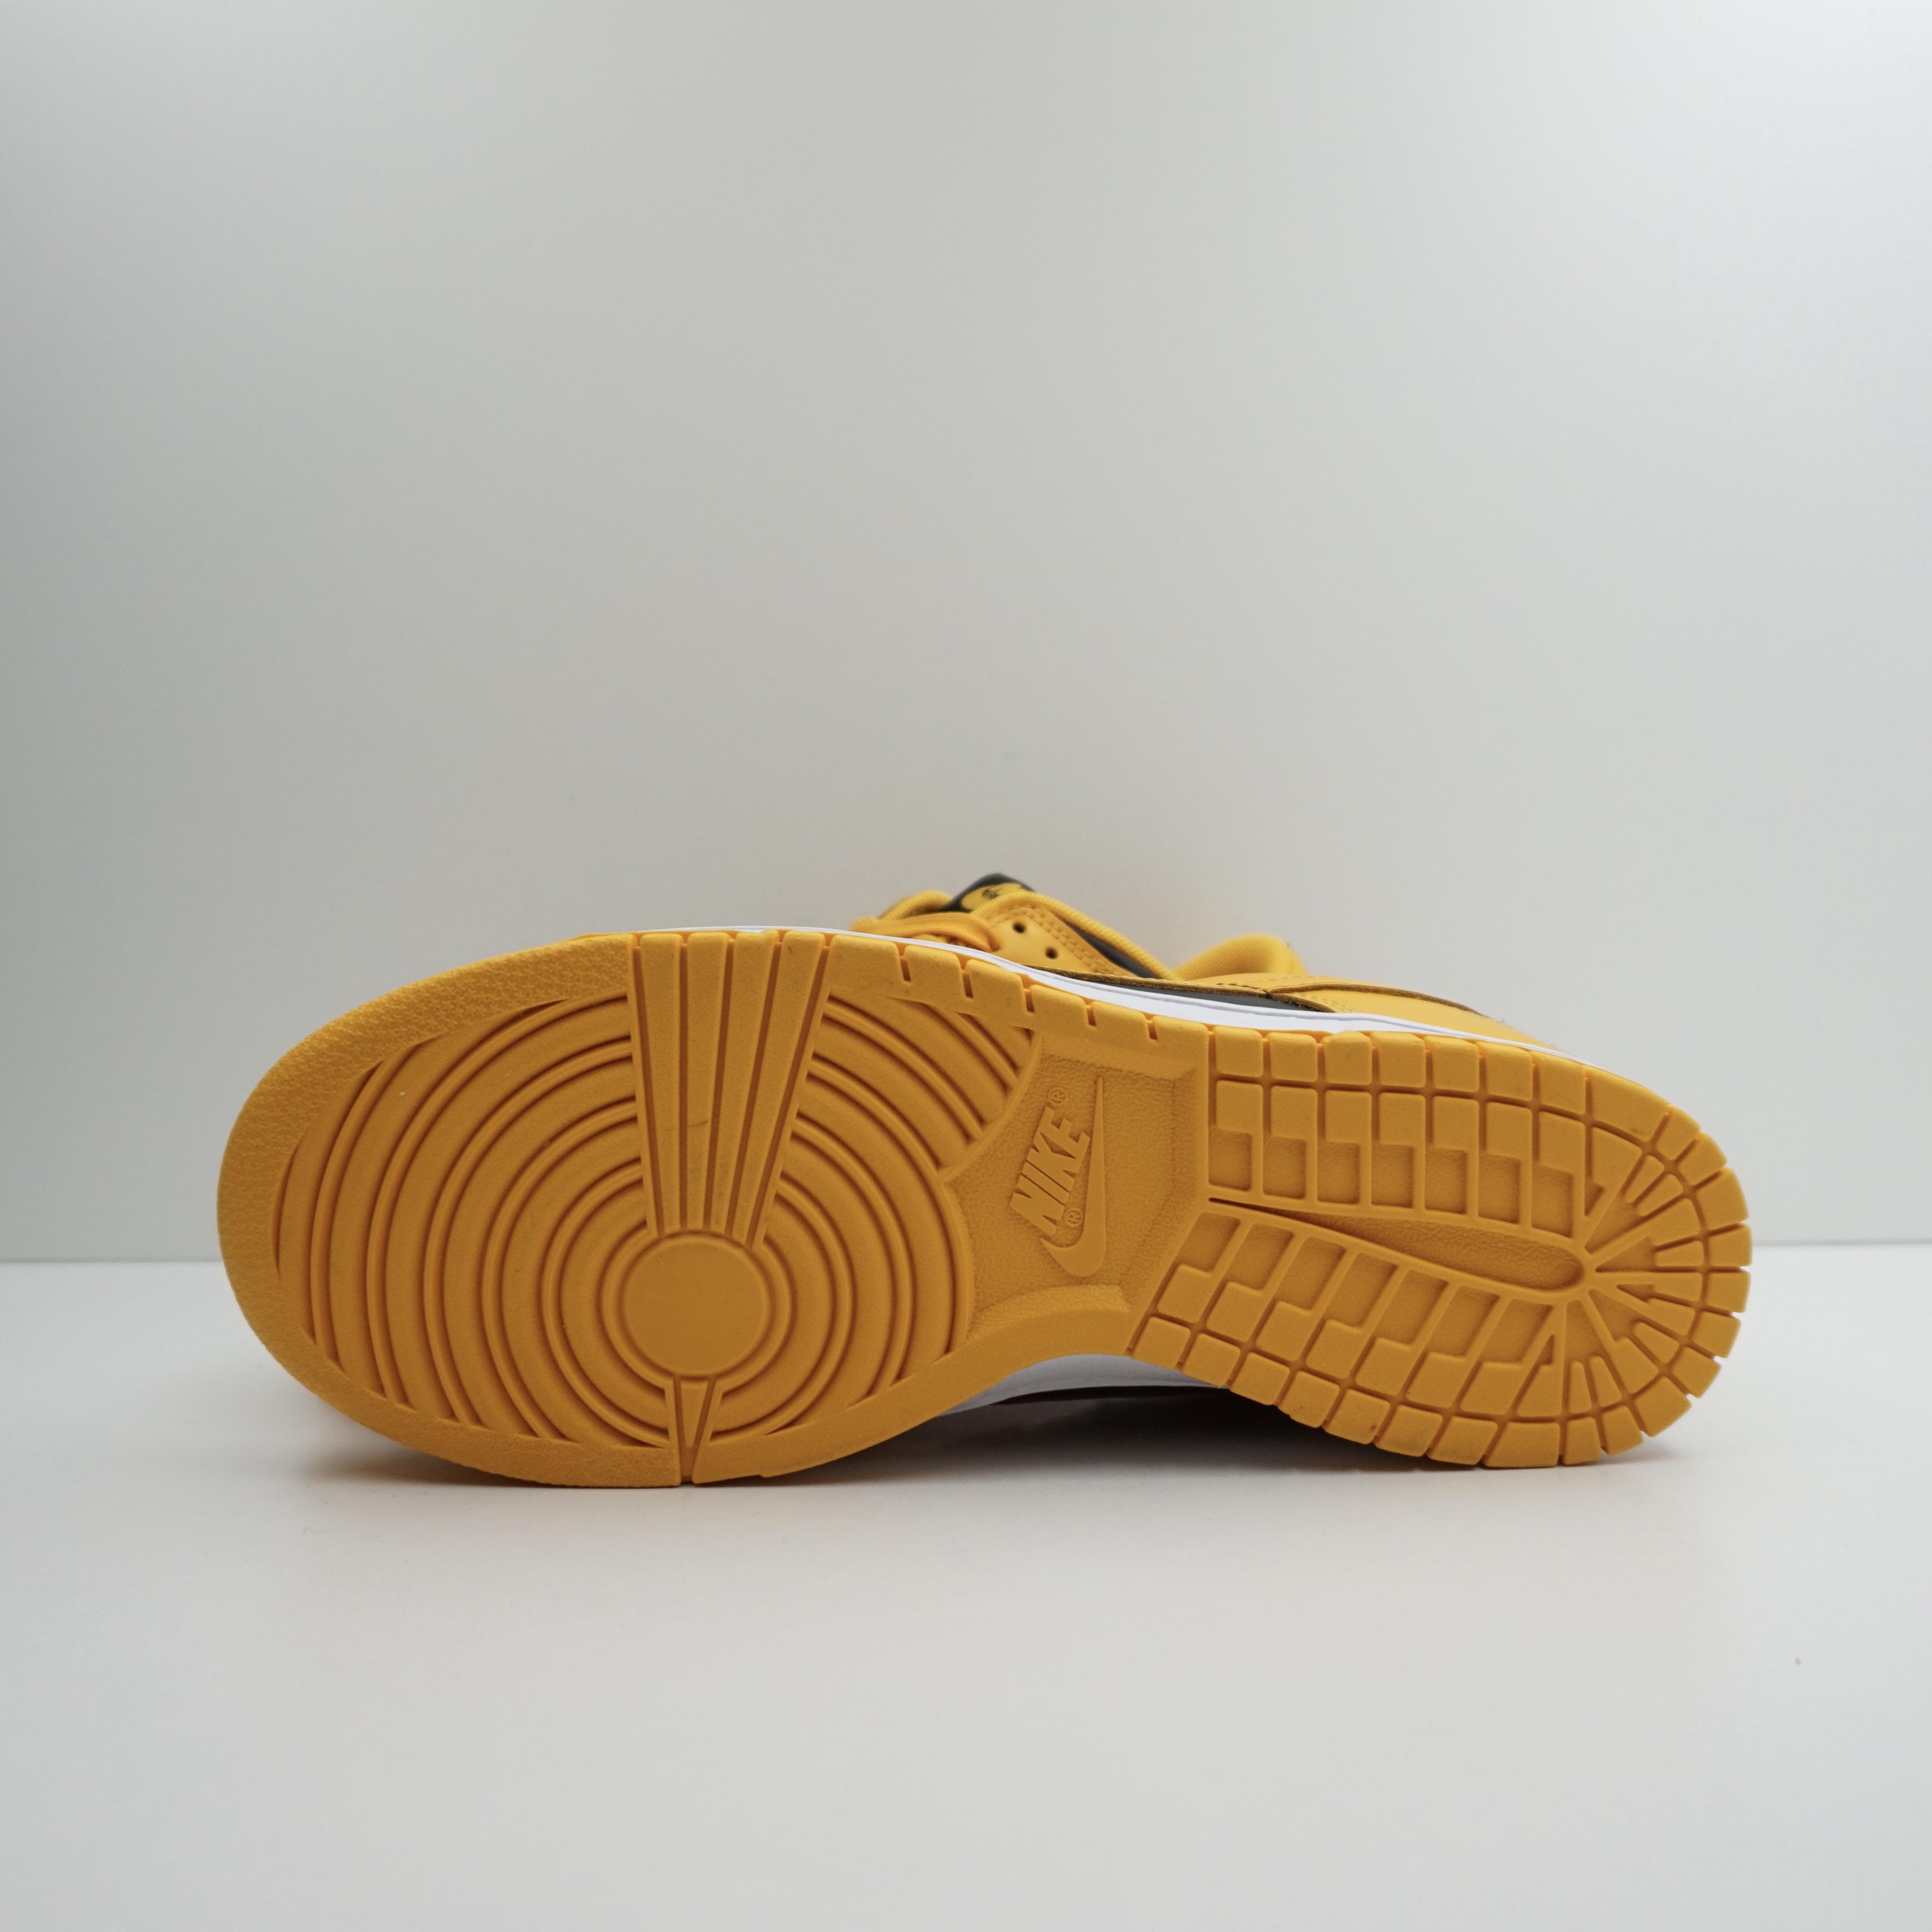 Nike Dunk Low Goldenrod (2021)